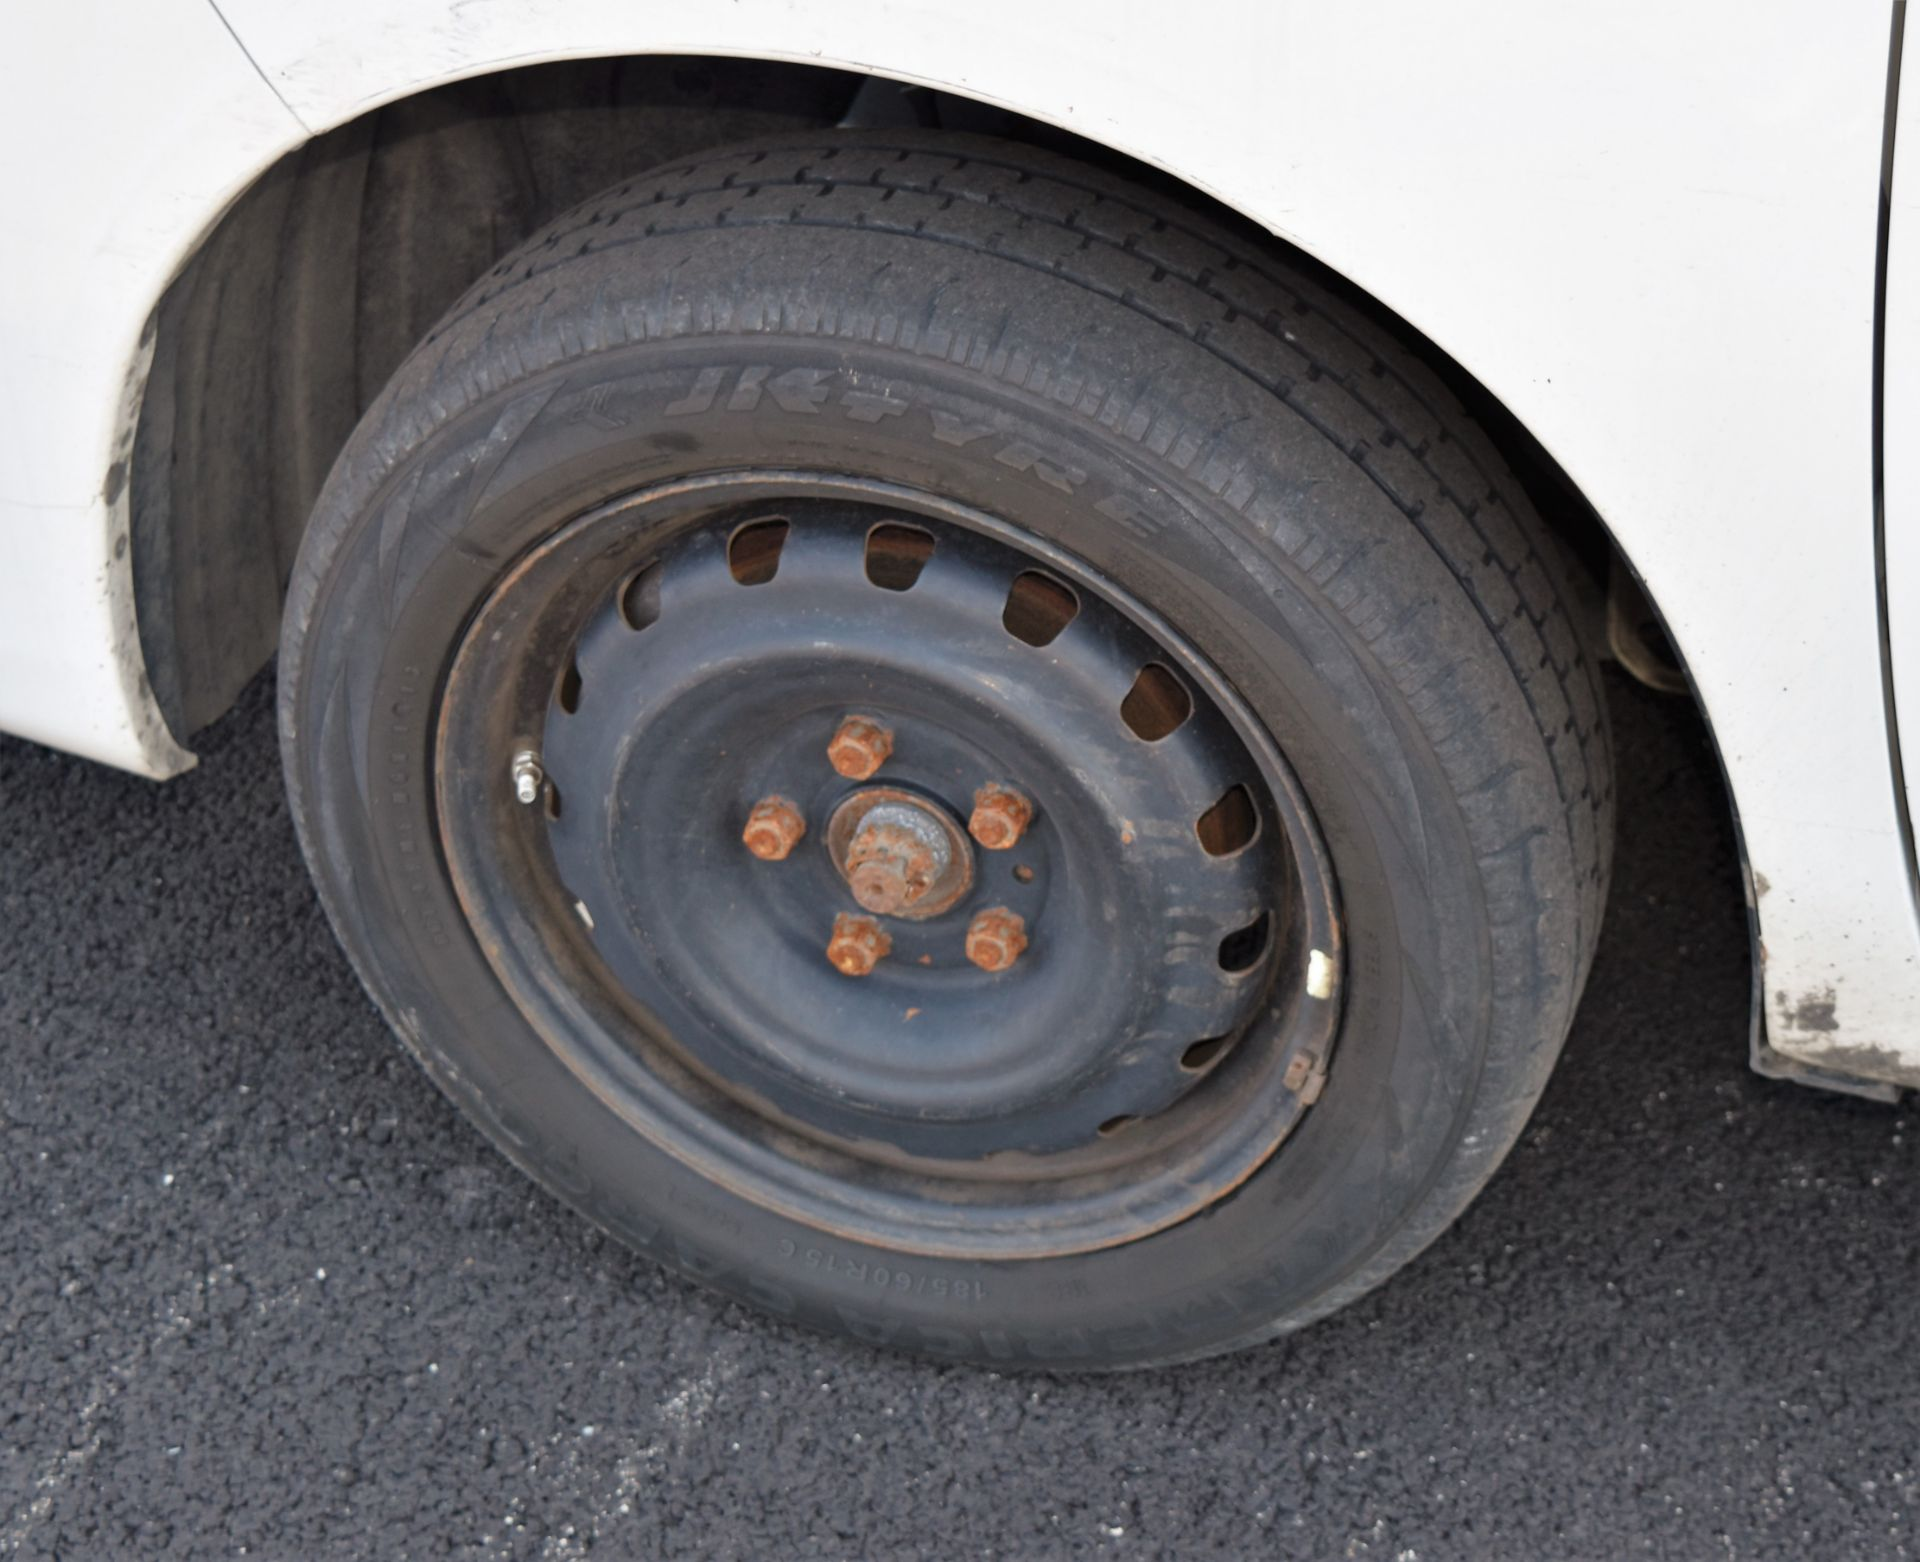 2013 Nissan NV200 Delivery Van - Image 33 of 54